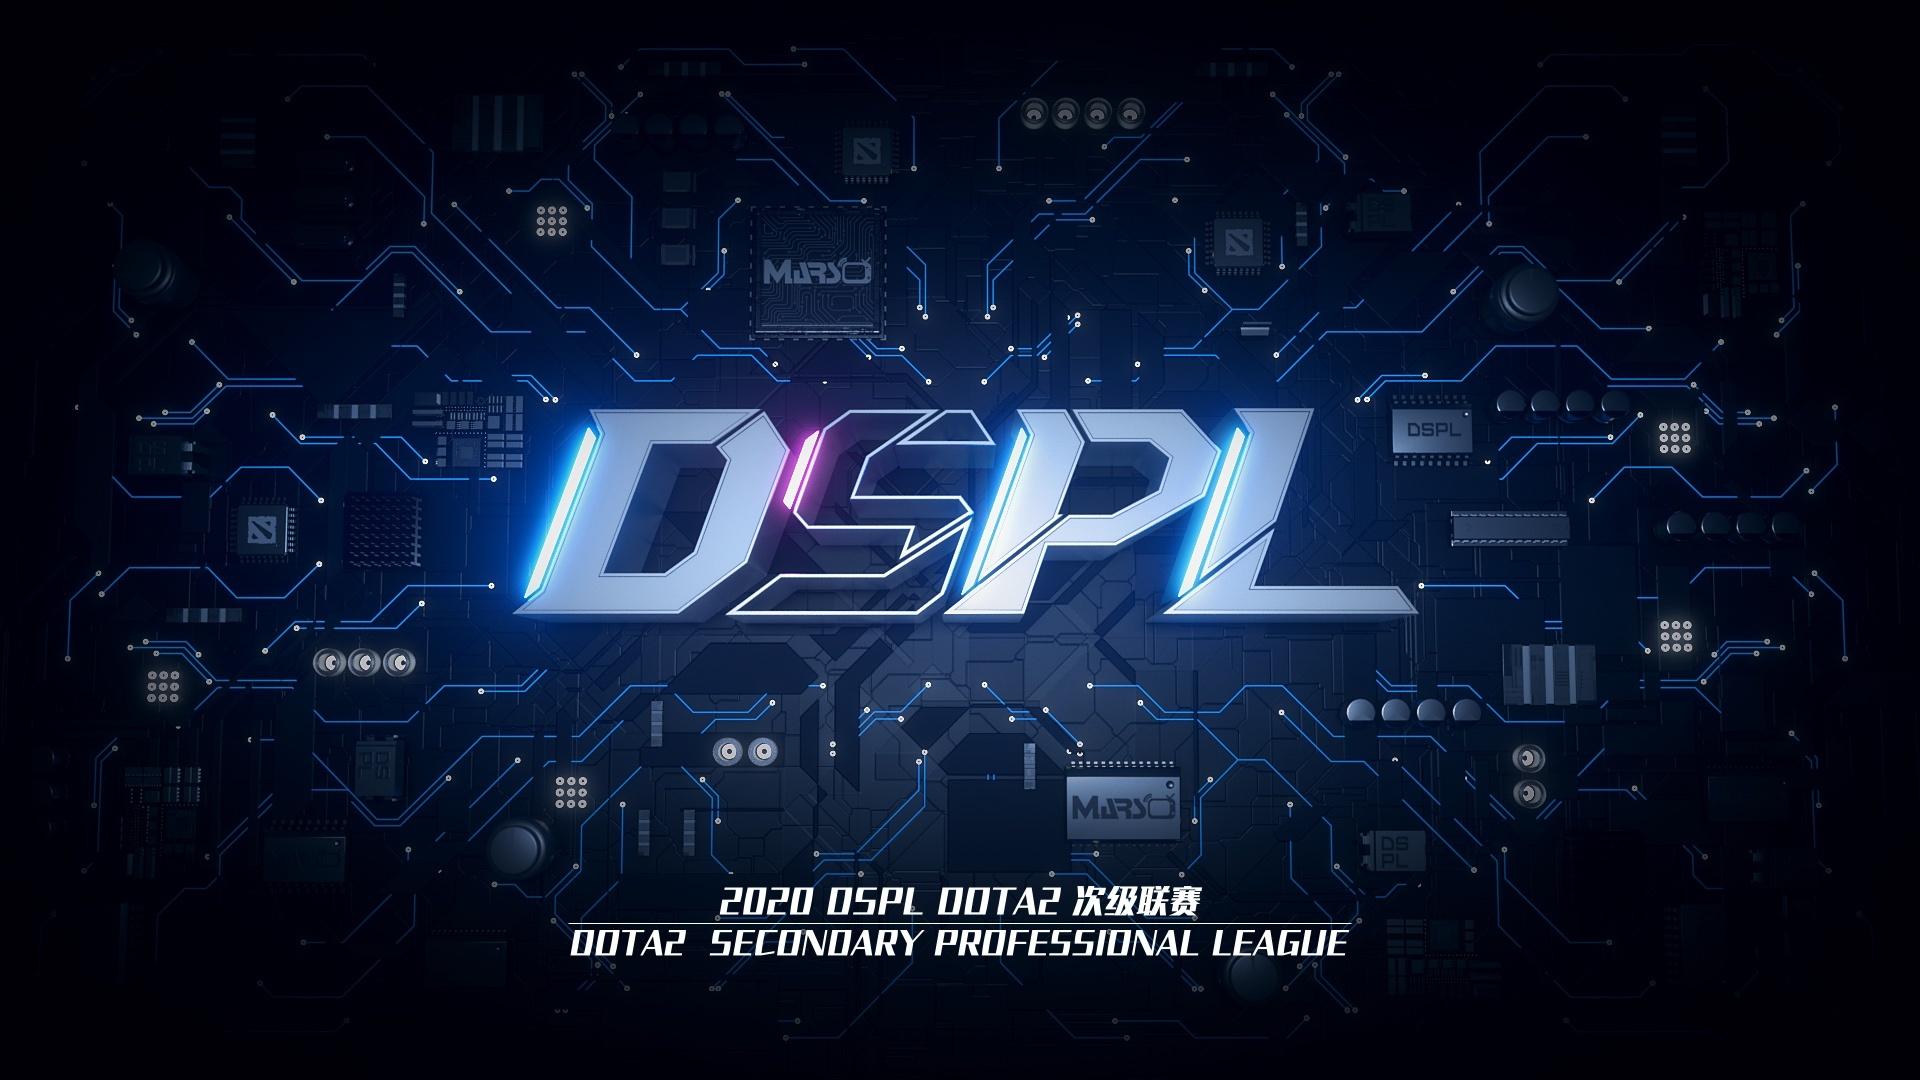 China Dota2 Professional League Season 2 (Secondary) Tournament